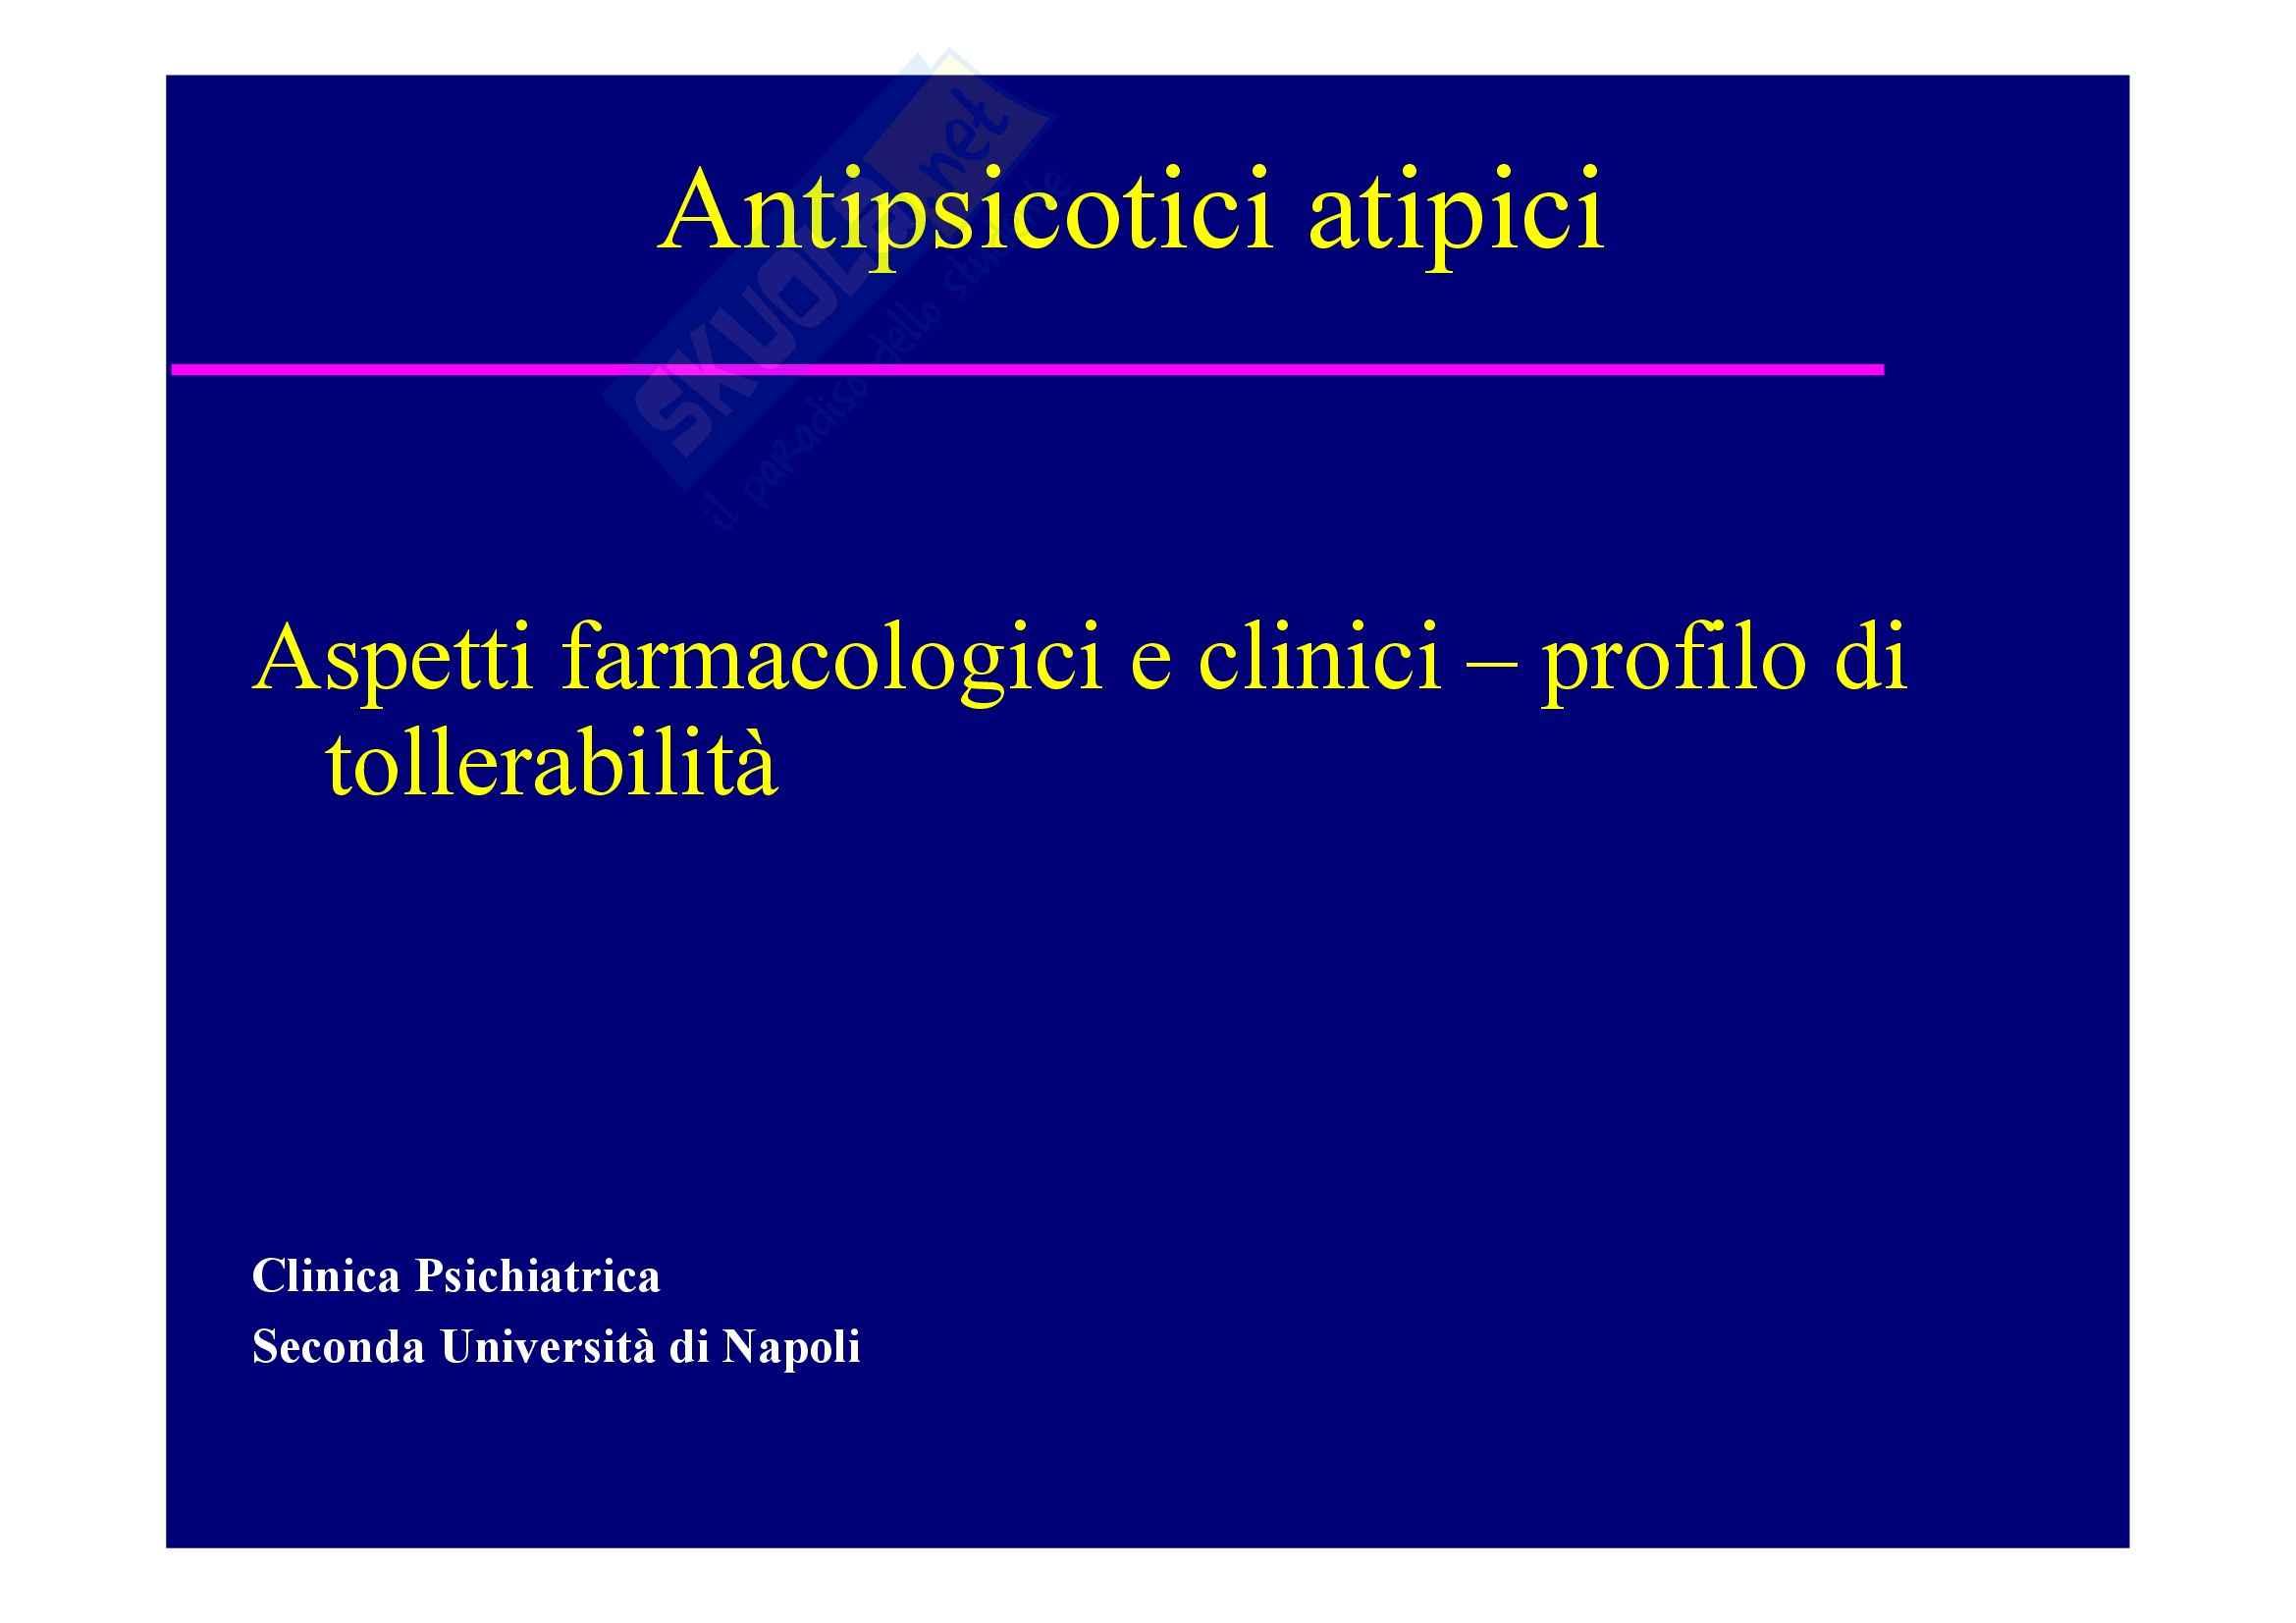 Psichiatria e neuropsichiatria infantile - antipsicotici atipici